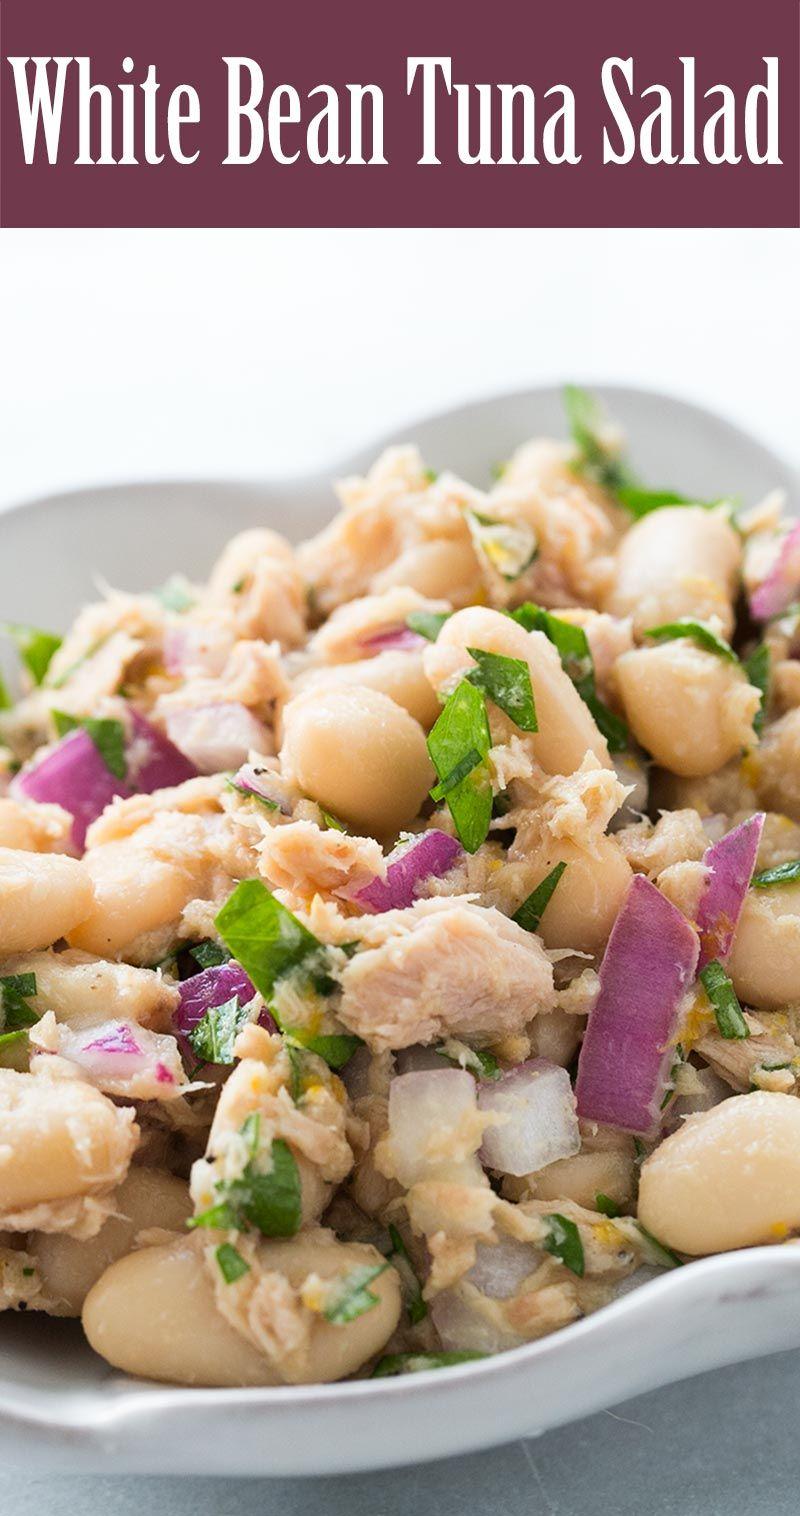 White Bean And Tuna Salad Recipe In 2020 Bean Recipes Food Recipes Mediterranean Diet Recipes